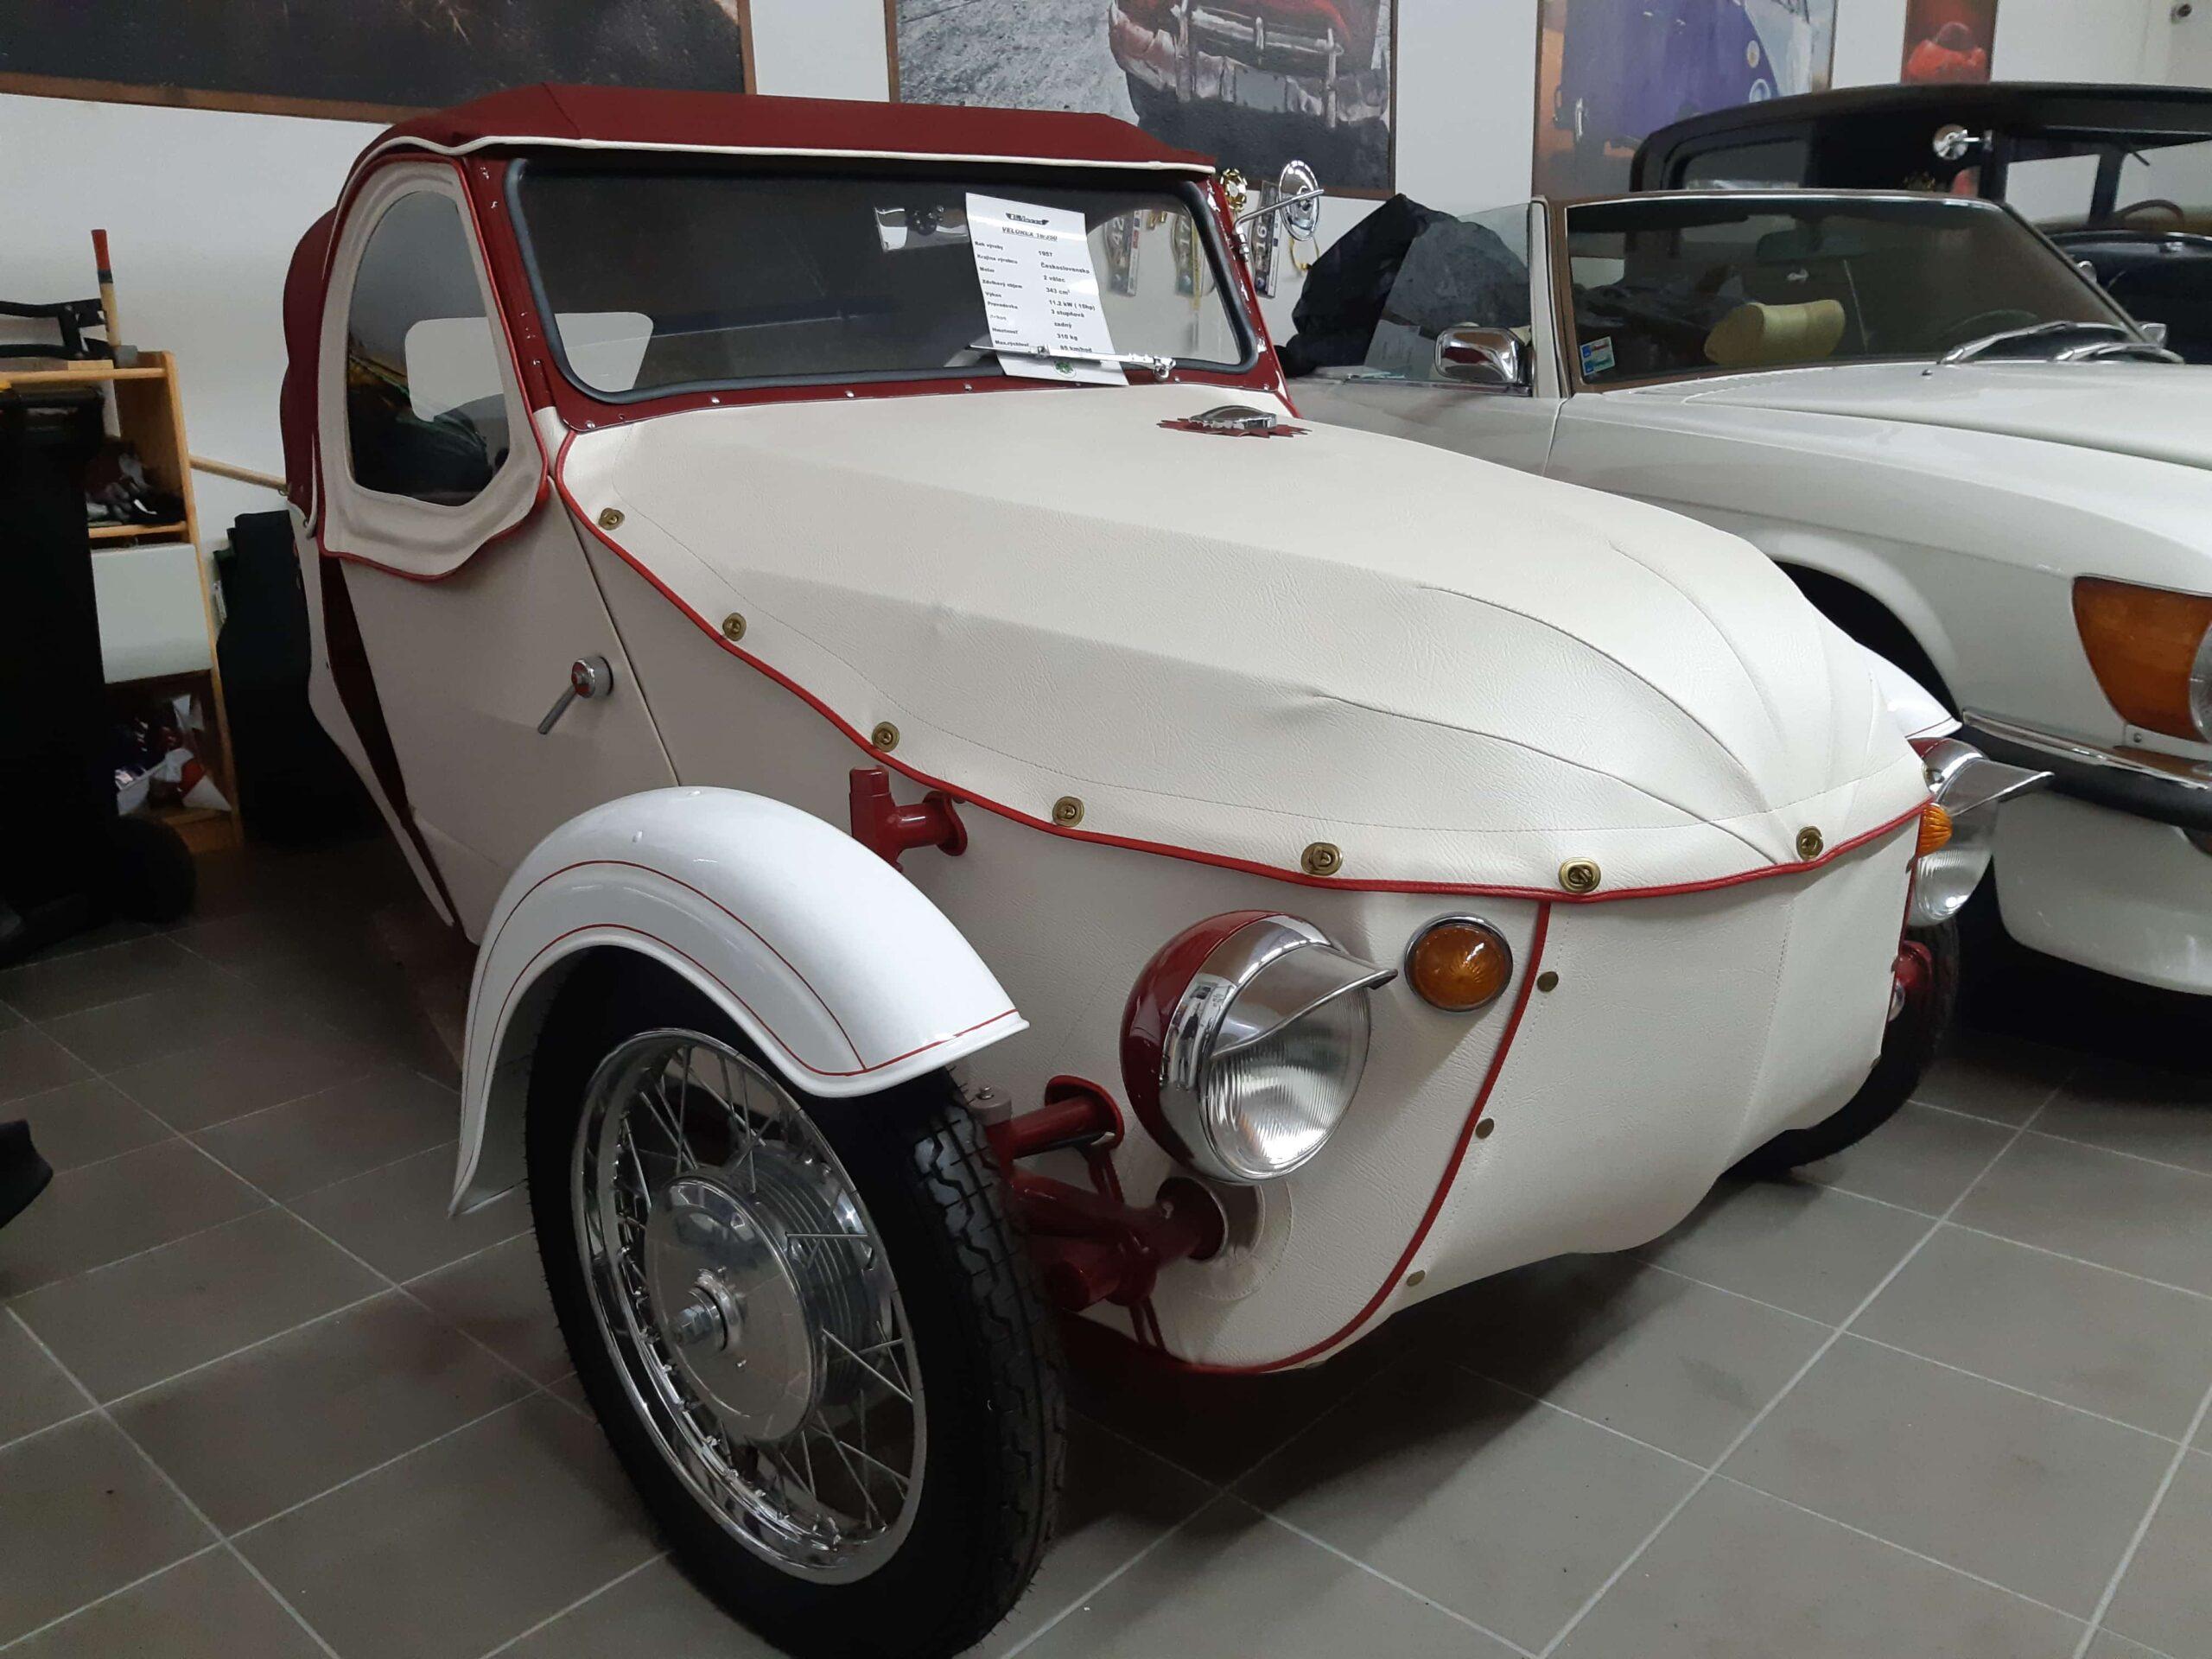 1958 Velorex 350